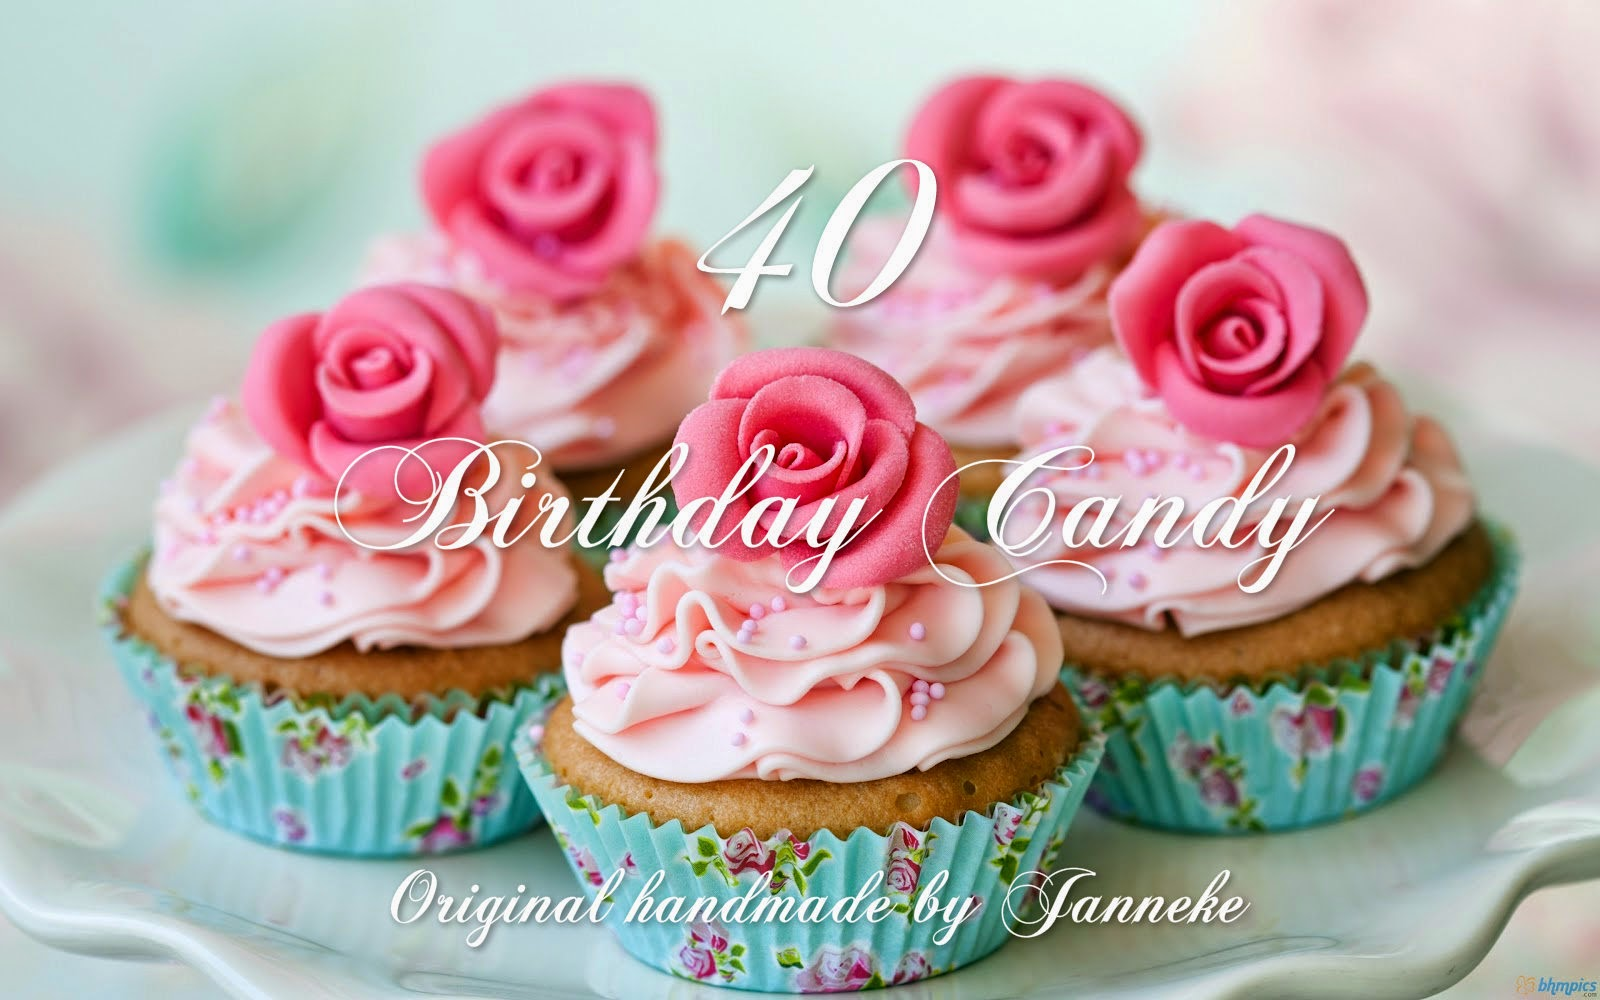 Candy by Janneke